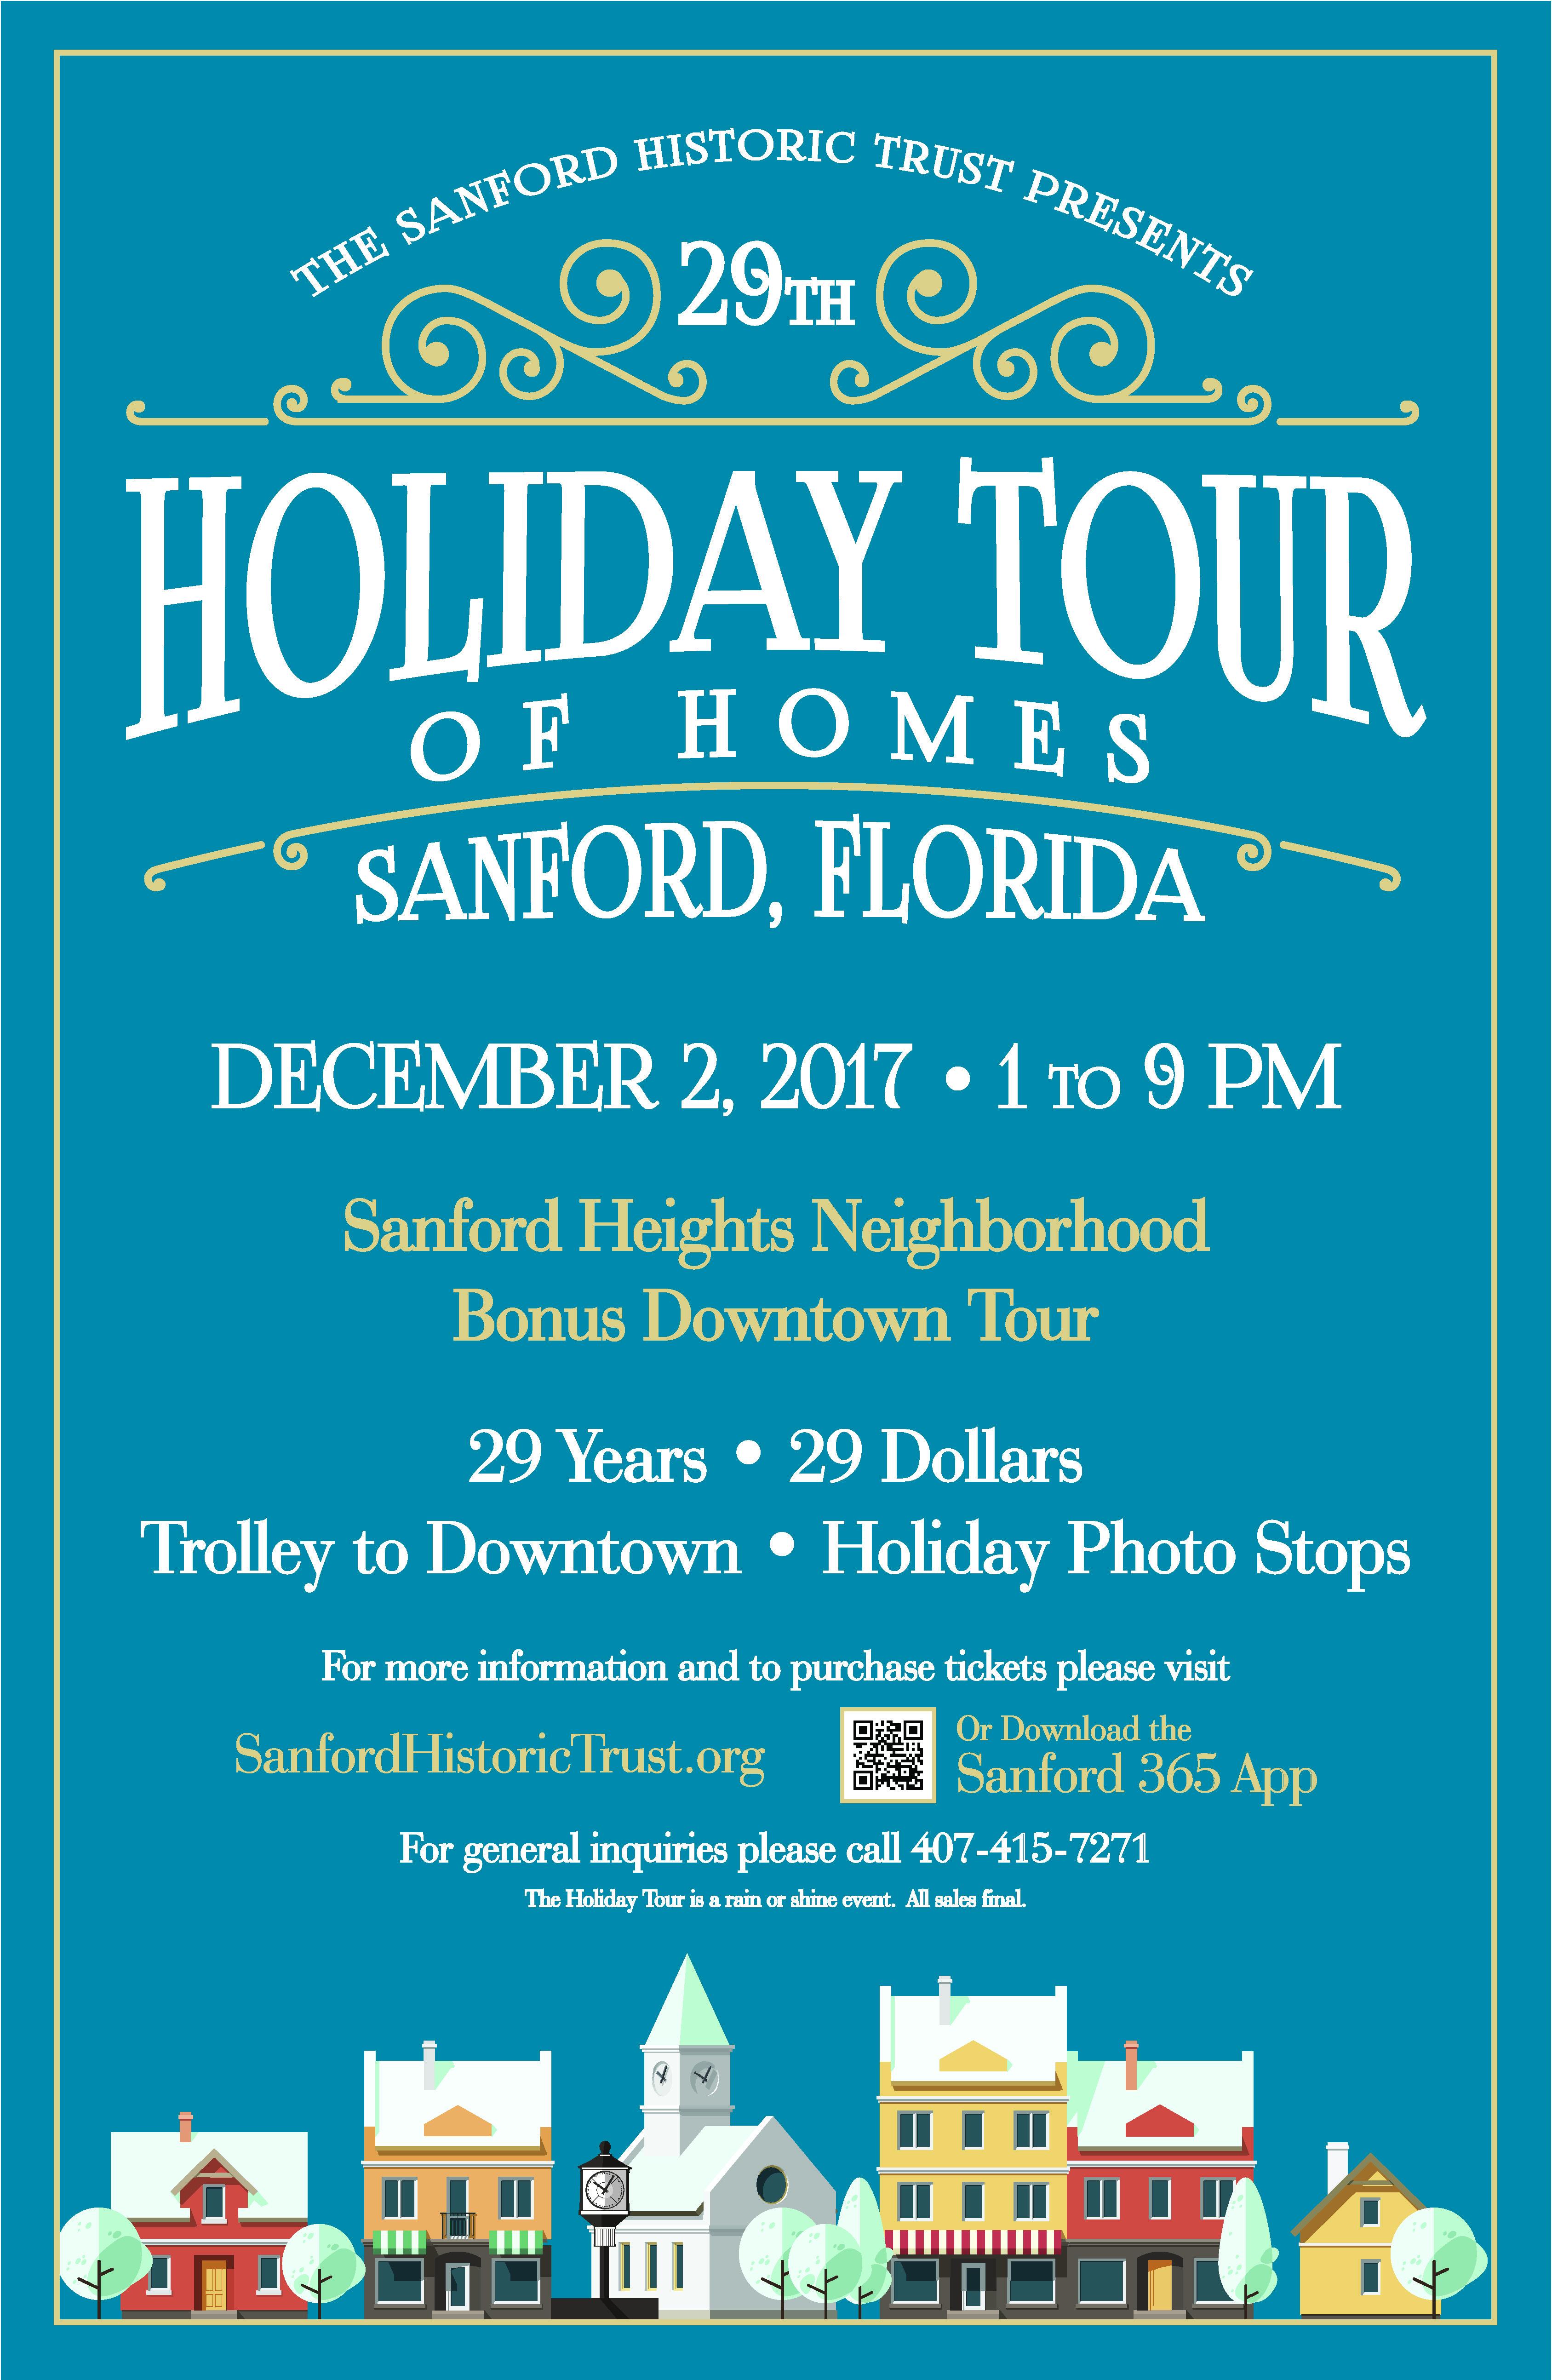 Sanford Historic Trust - Home